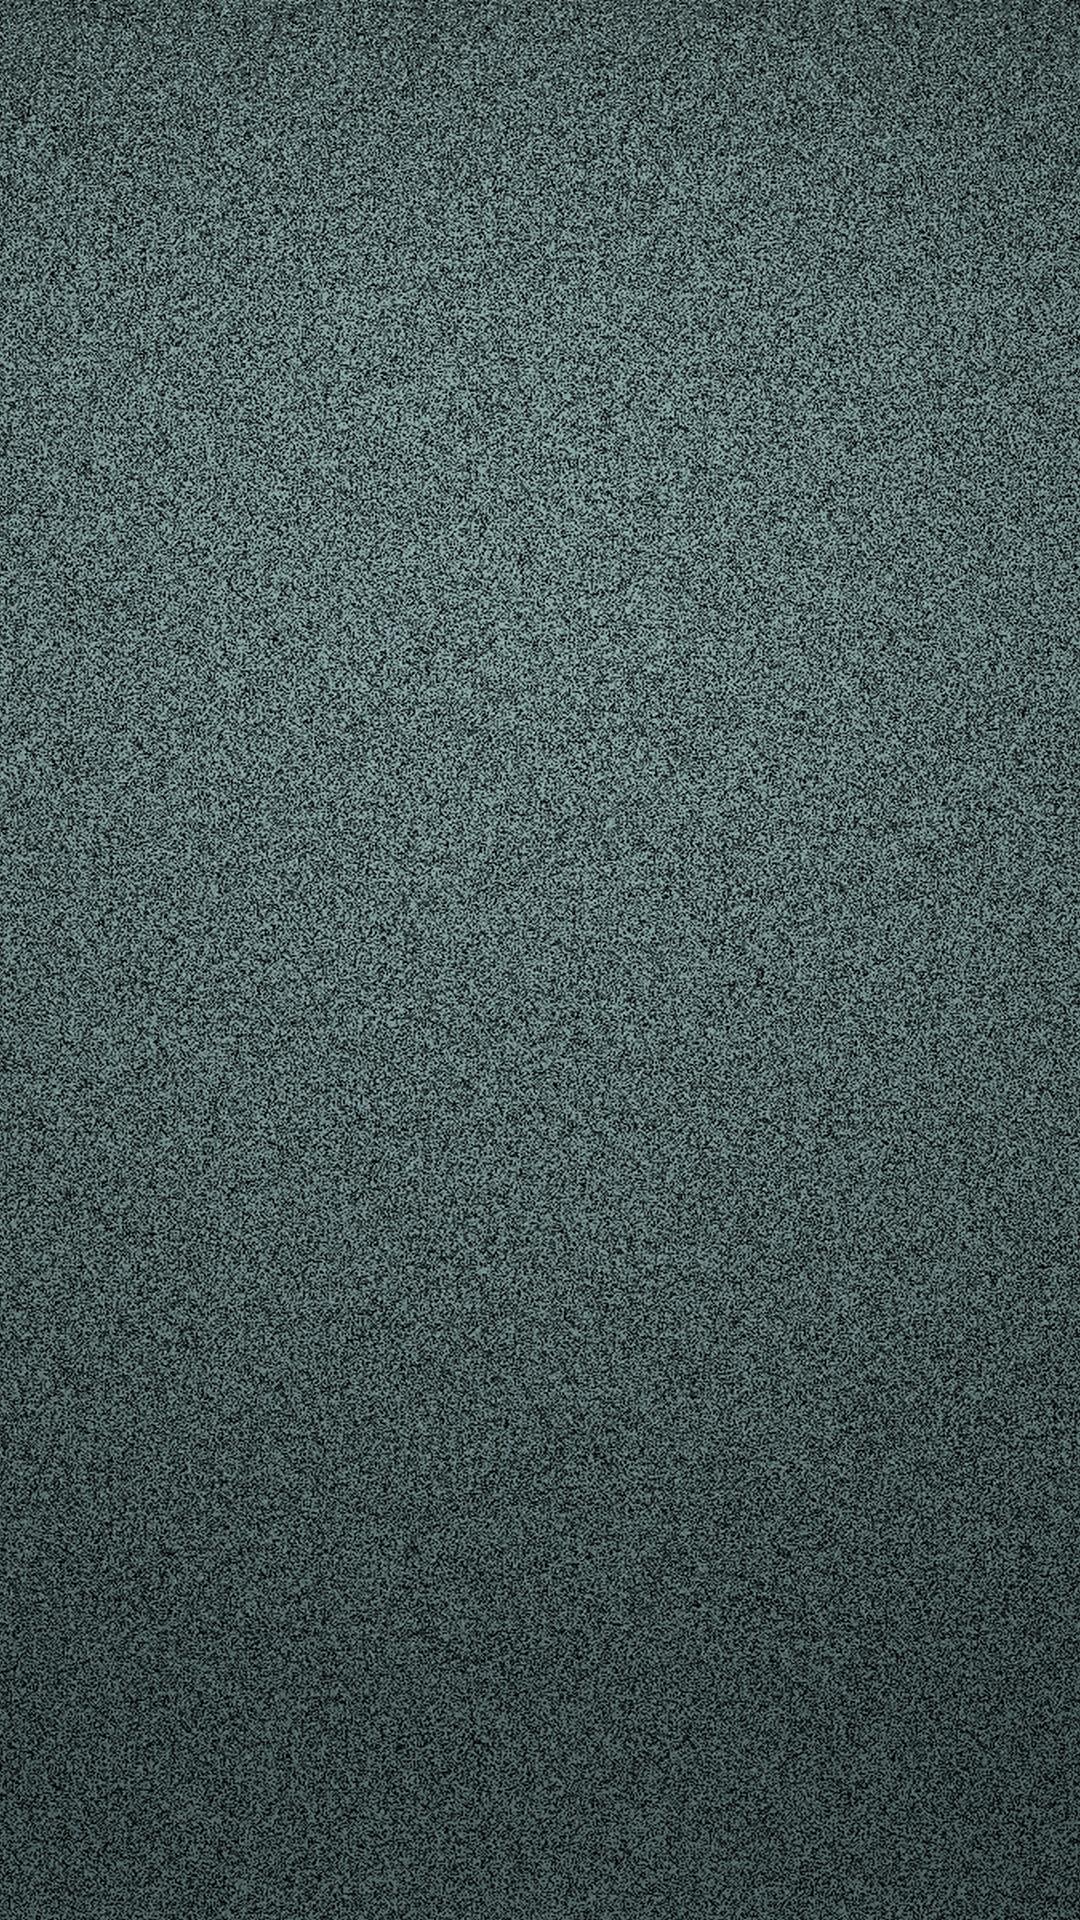 Download Wallpaper Aquarium 3d Wallpapers For Galaxy Green Dot Texture Background